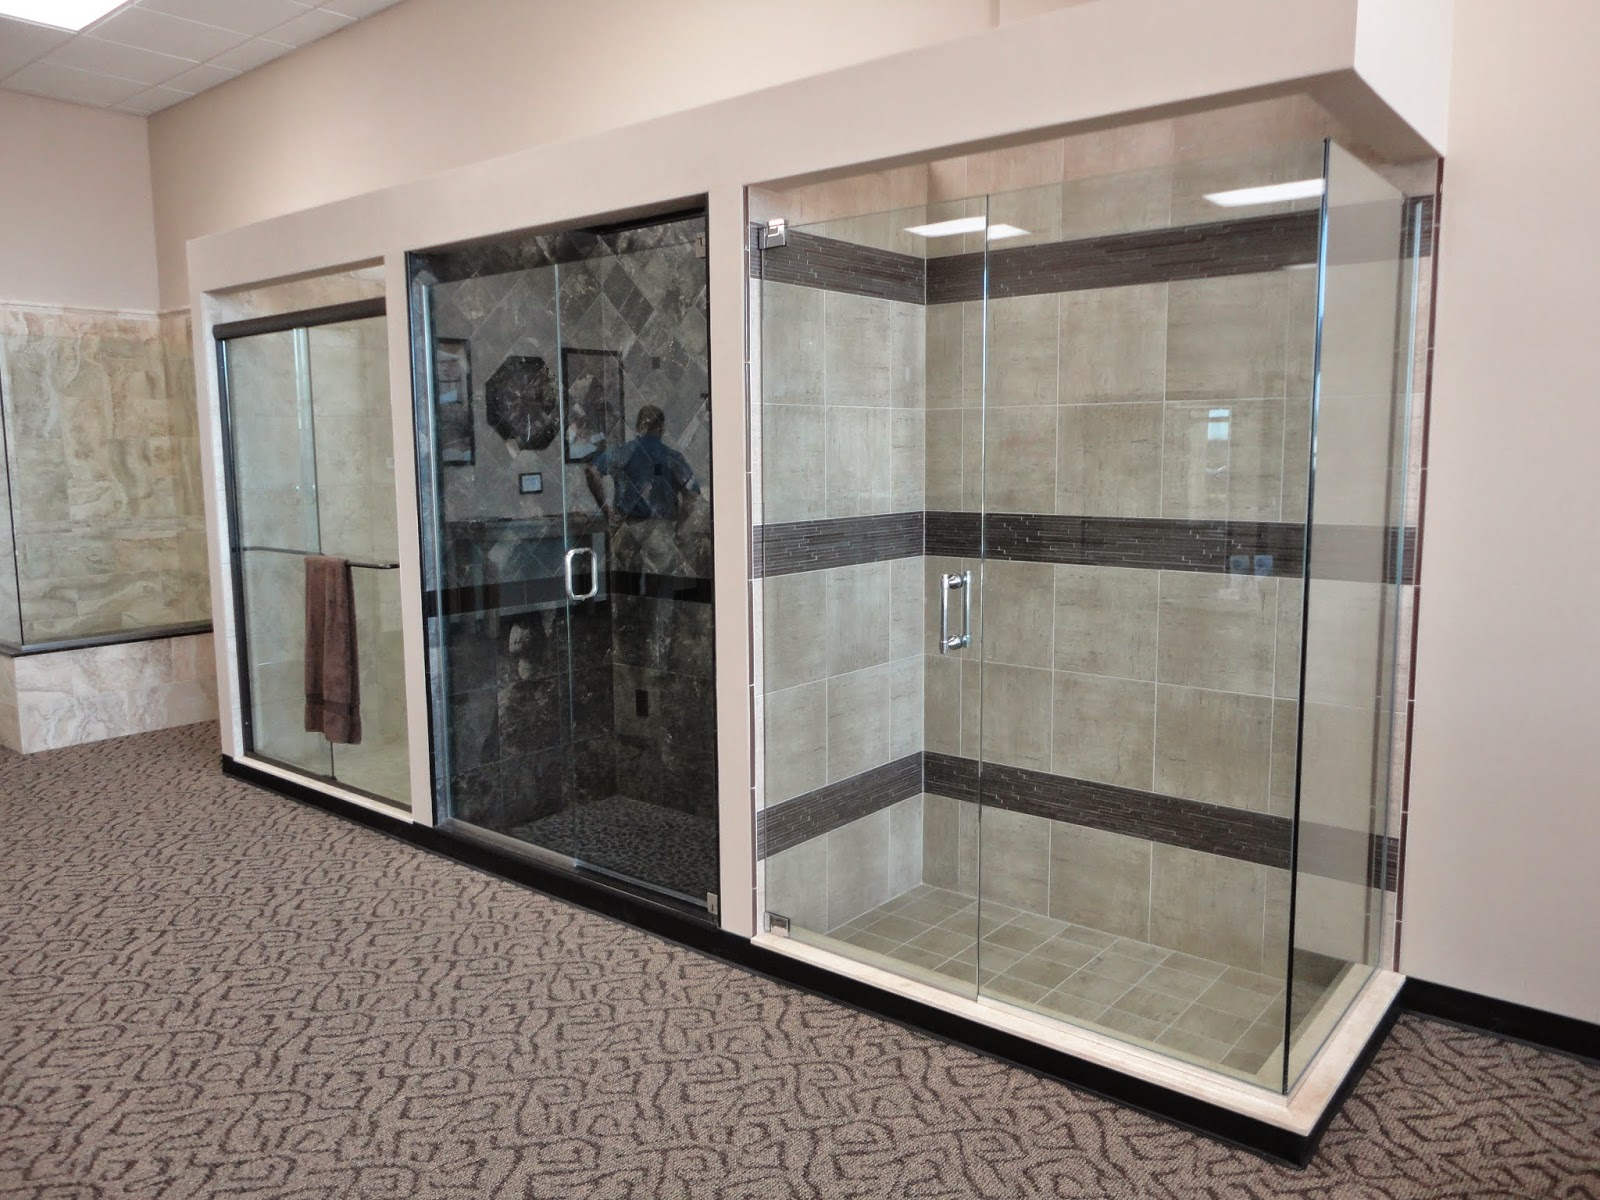 Tile Sarasota: Here are four shower displays we built for My Shower ...